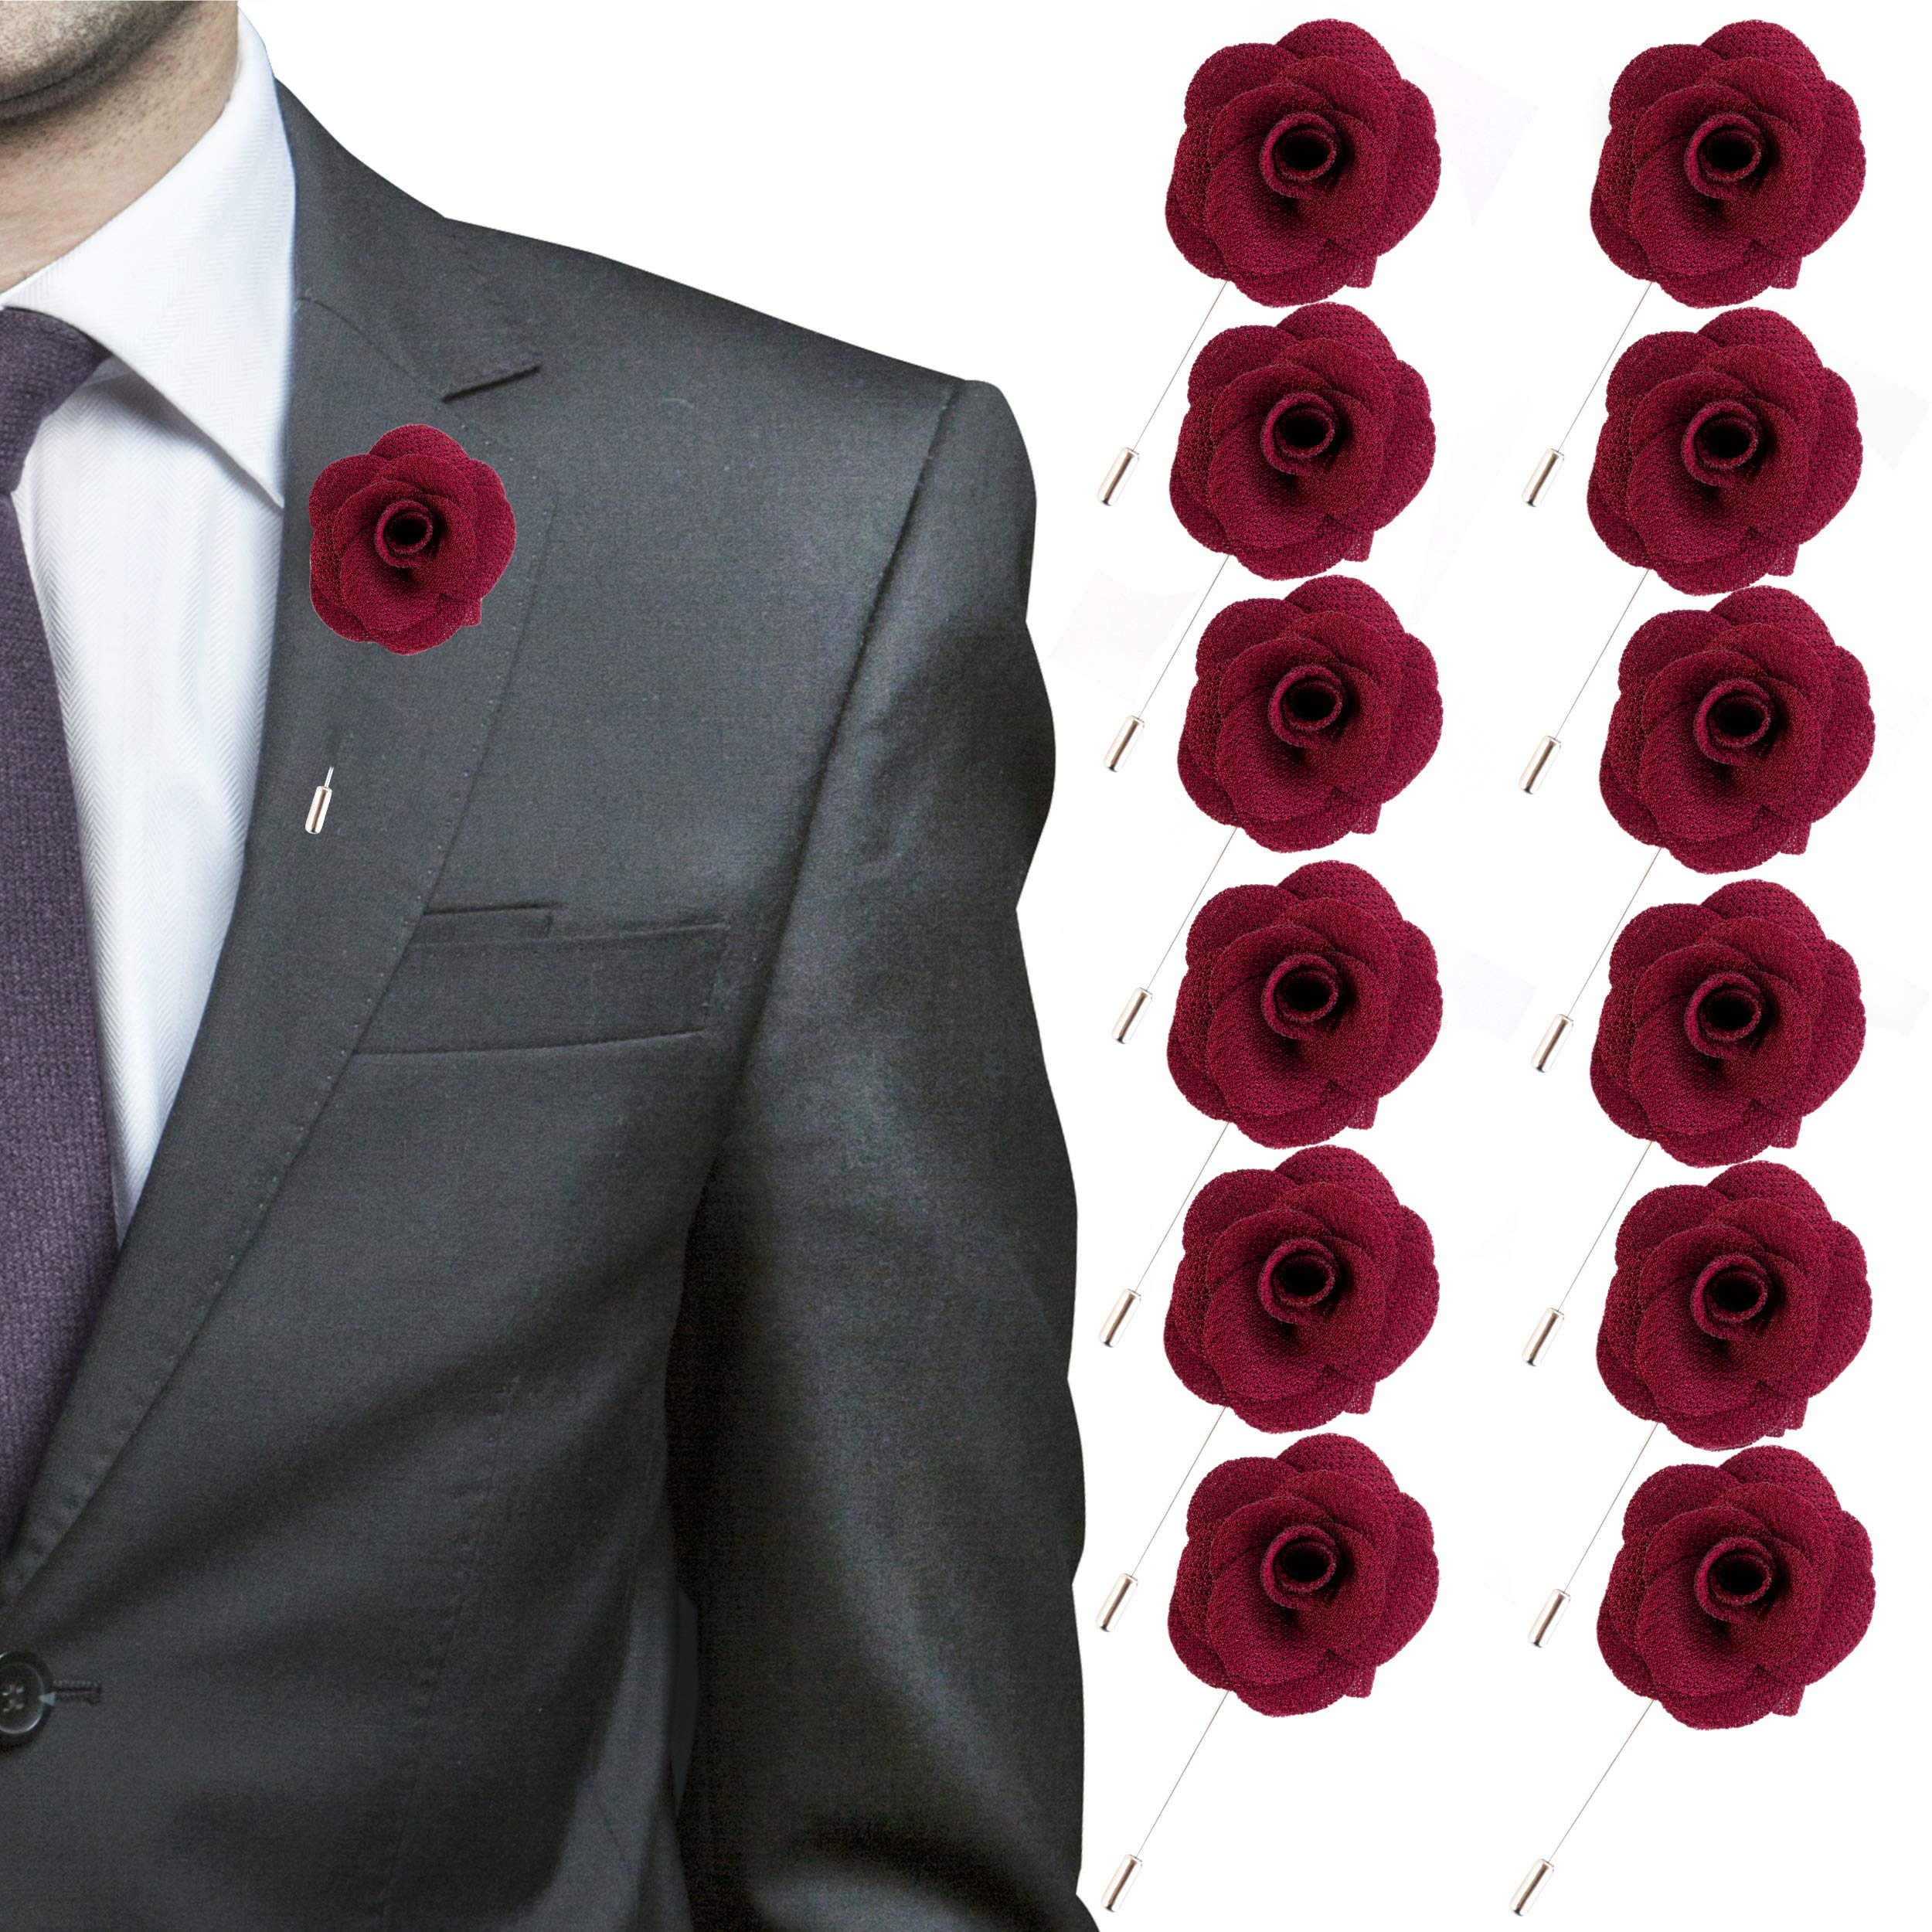 JLIKA Lapel Flower Pin Rose for Wedding Boutonniere Stick - Set of 12 PINS (Burgundy)